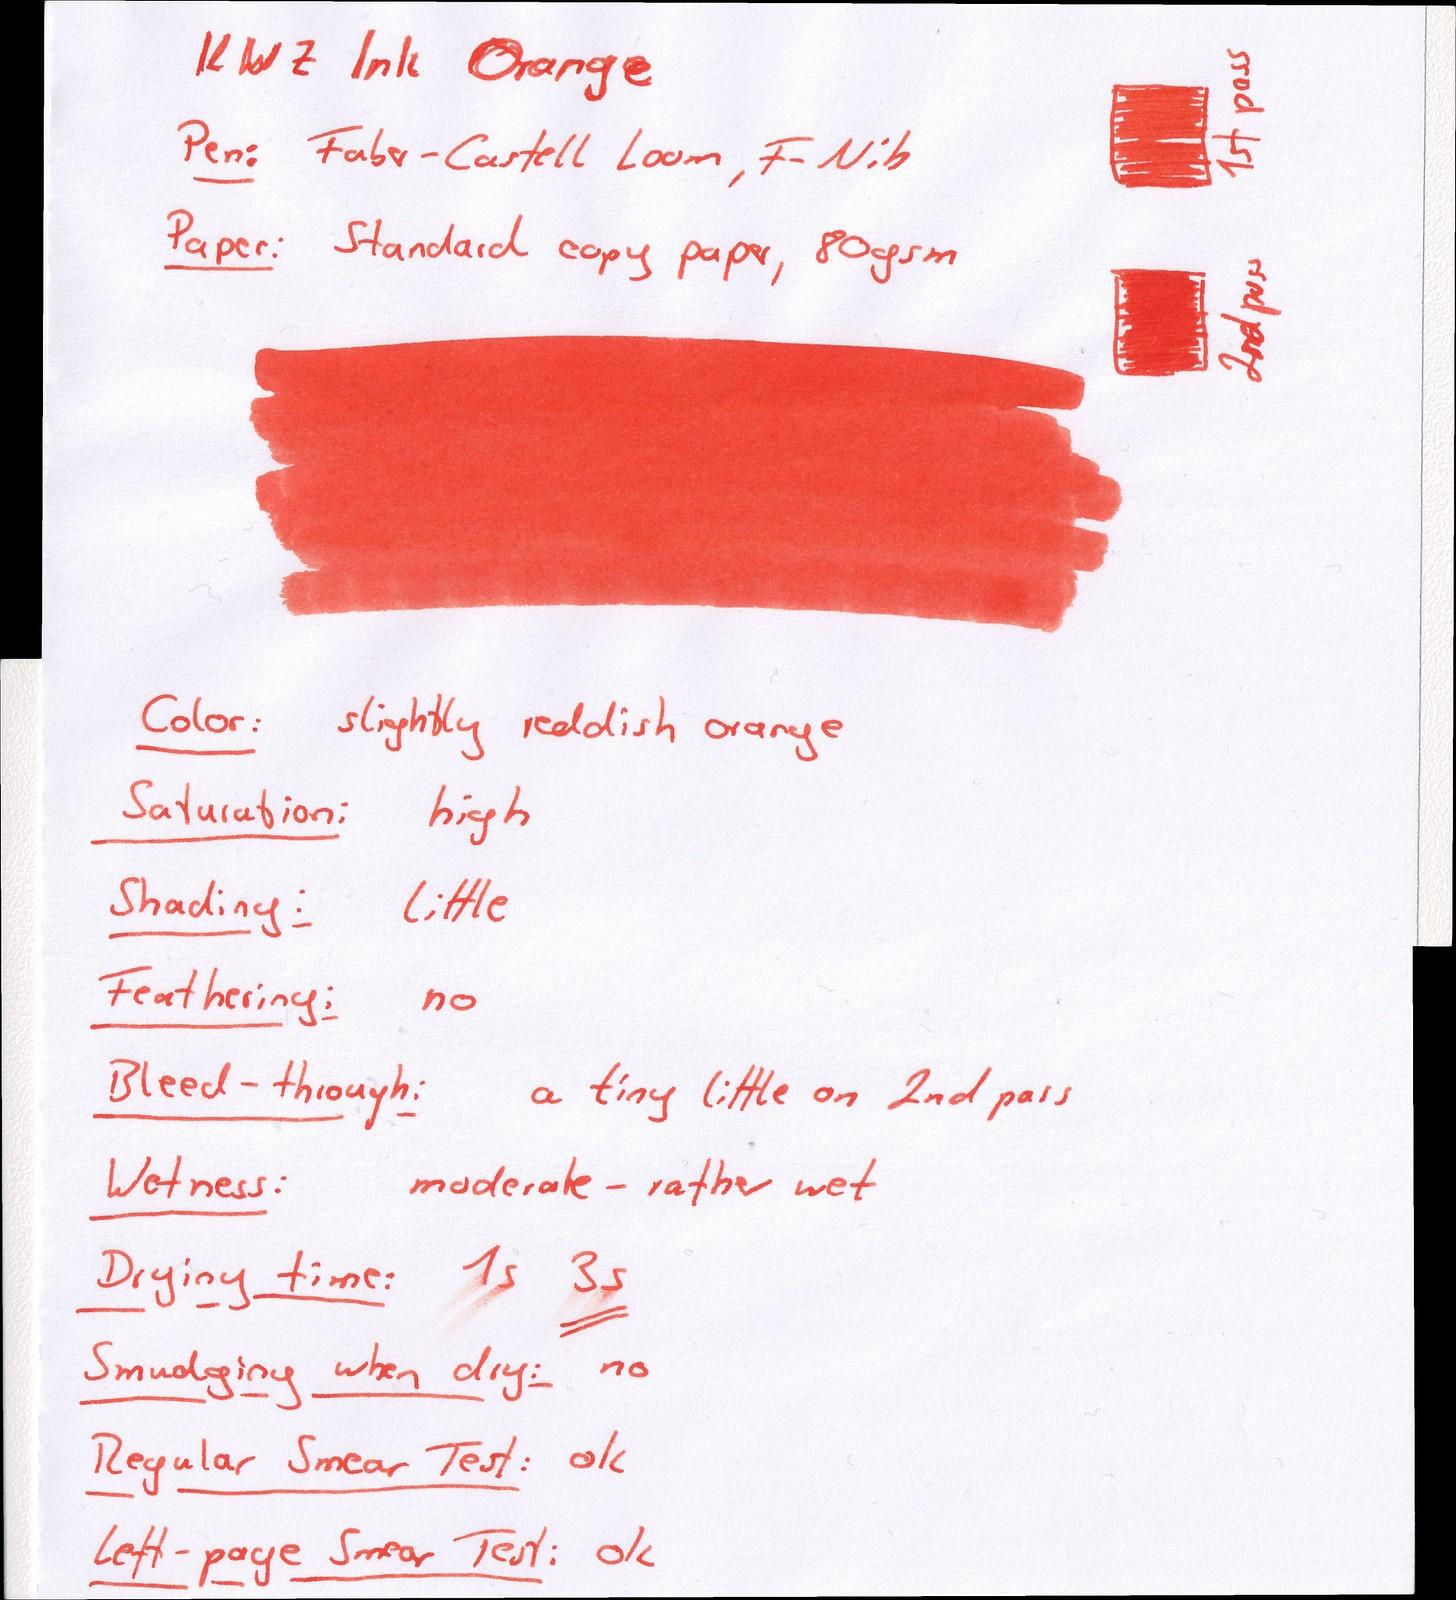 KWZ Ink Orange on standard copy paper